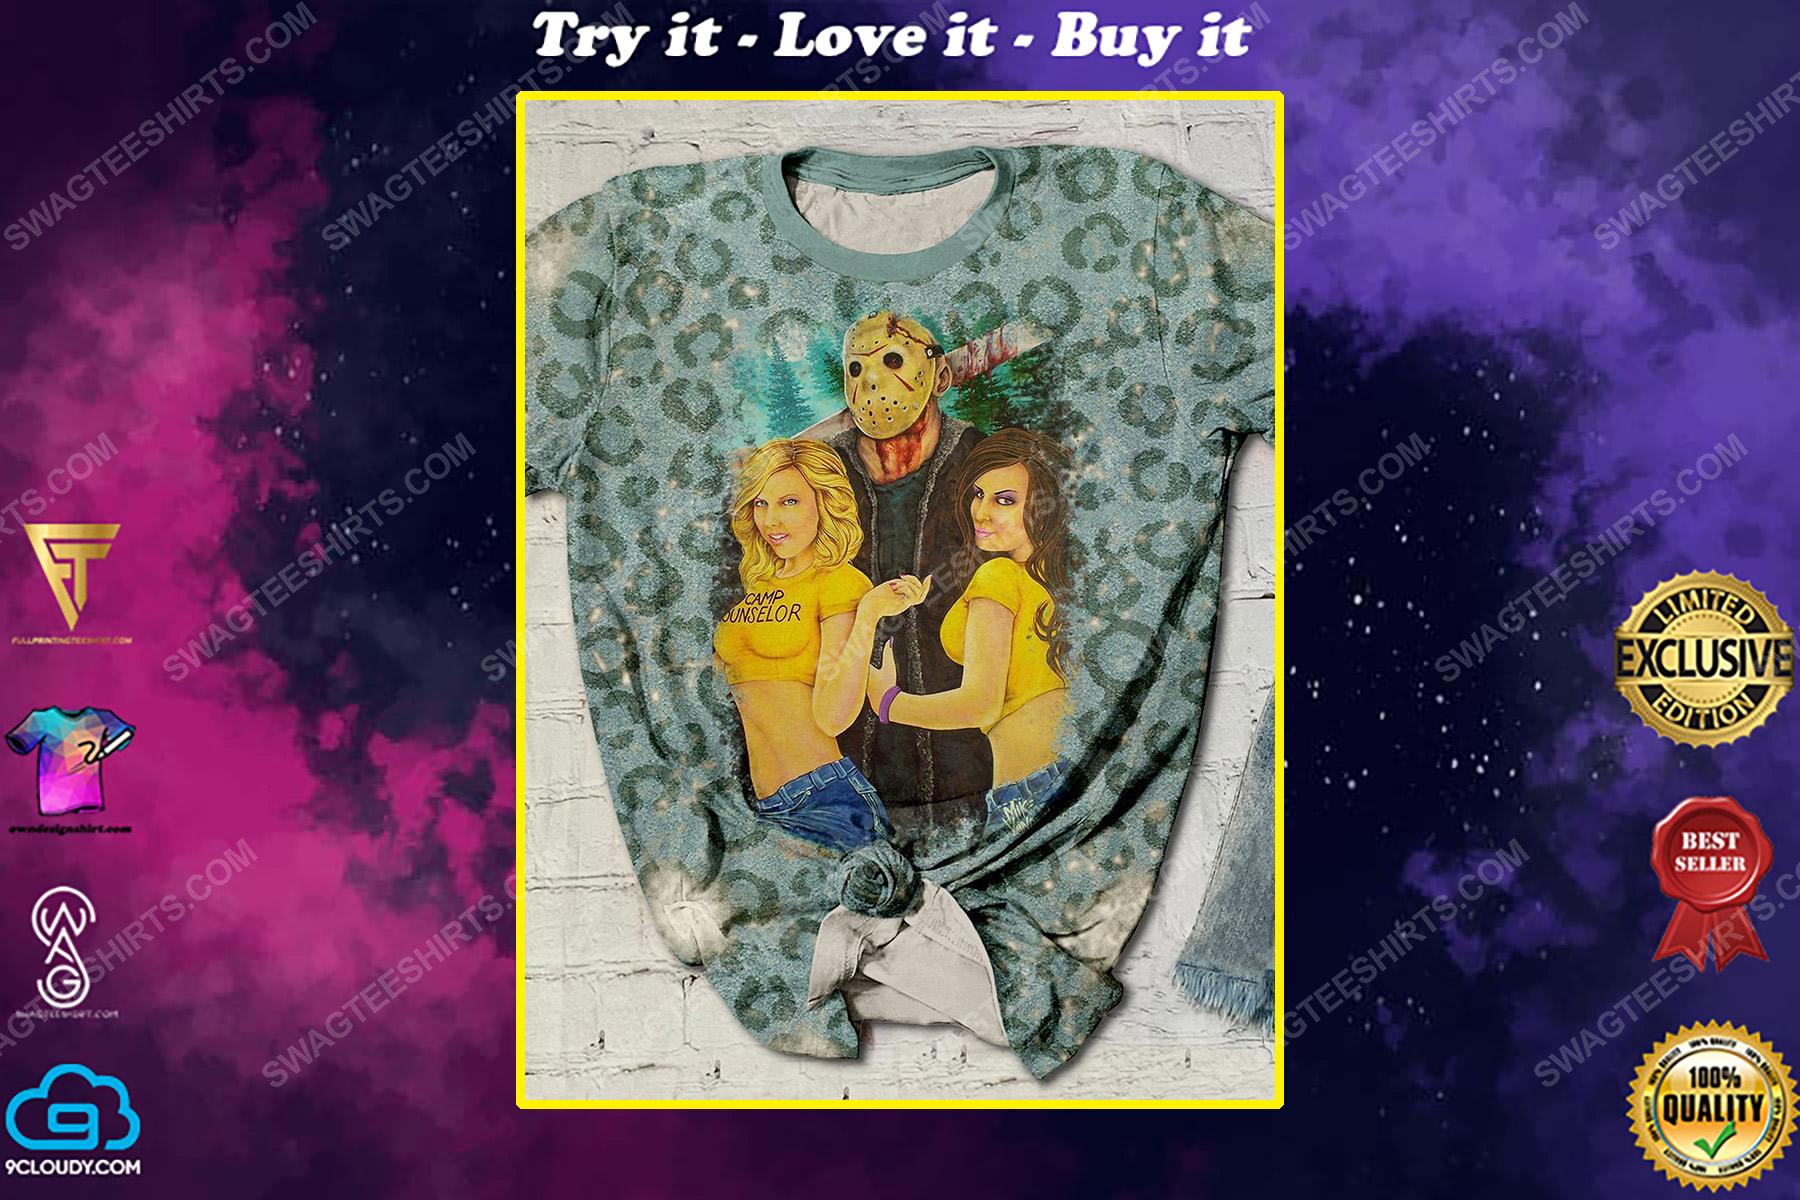 Halloween night jason voorhees friday the 13th leopard shirt